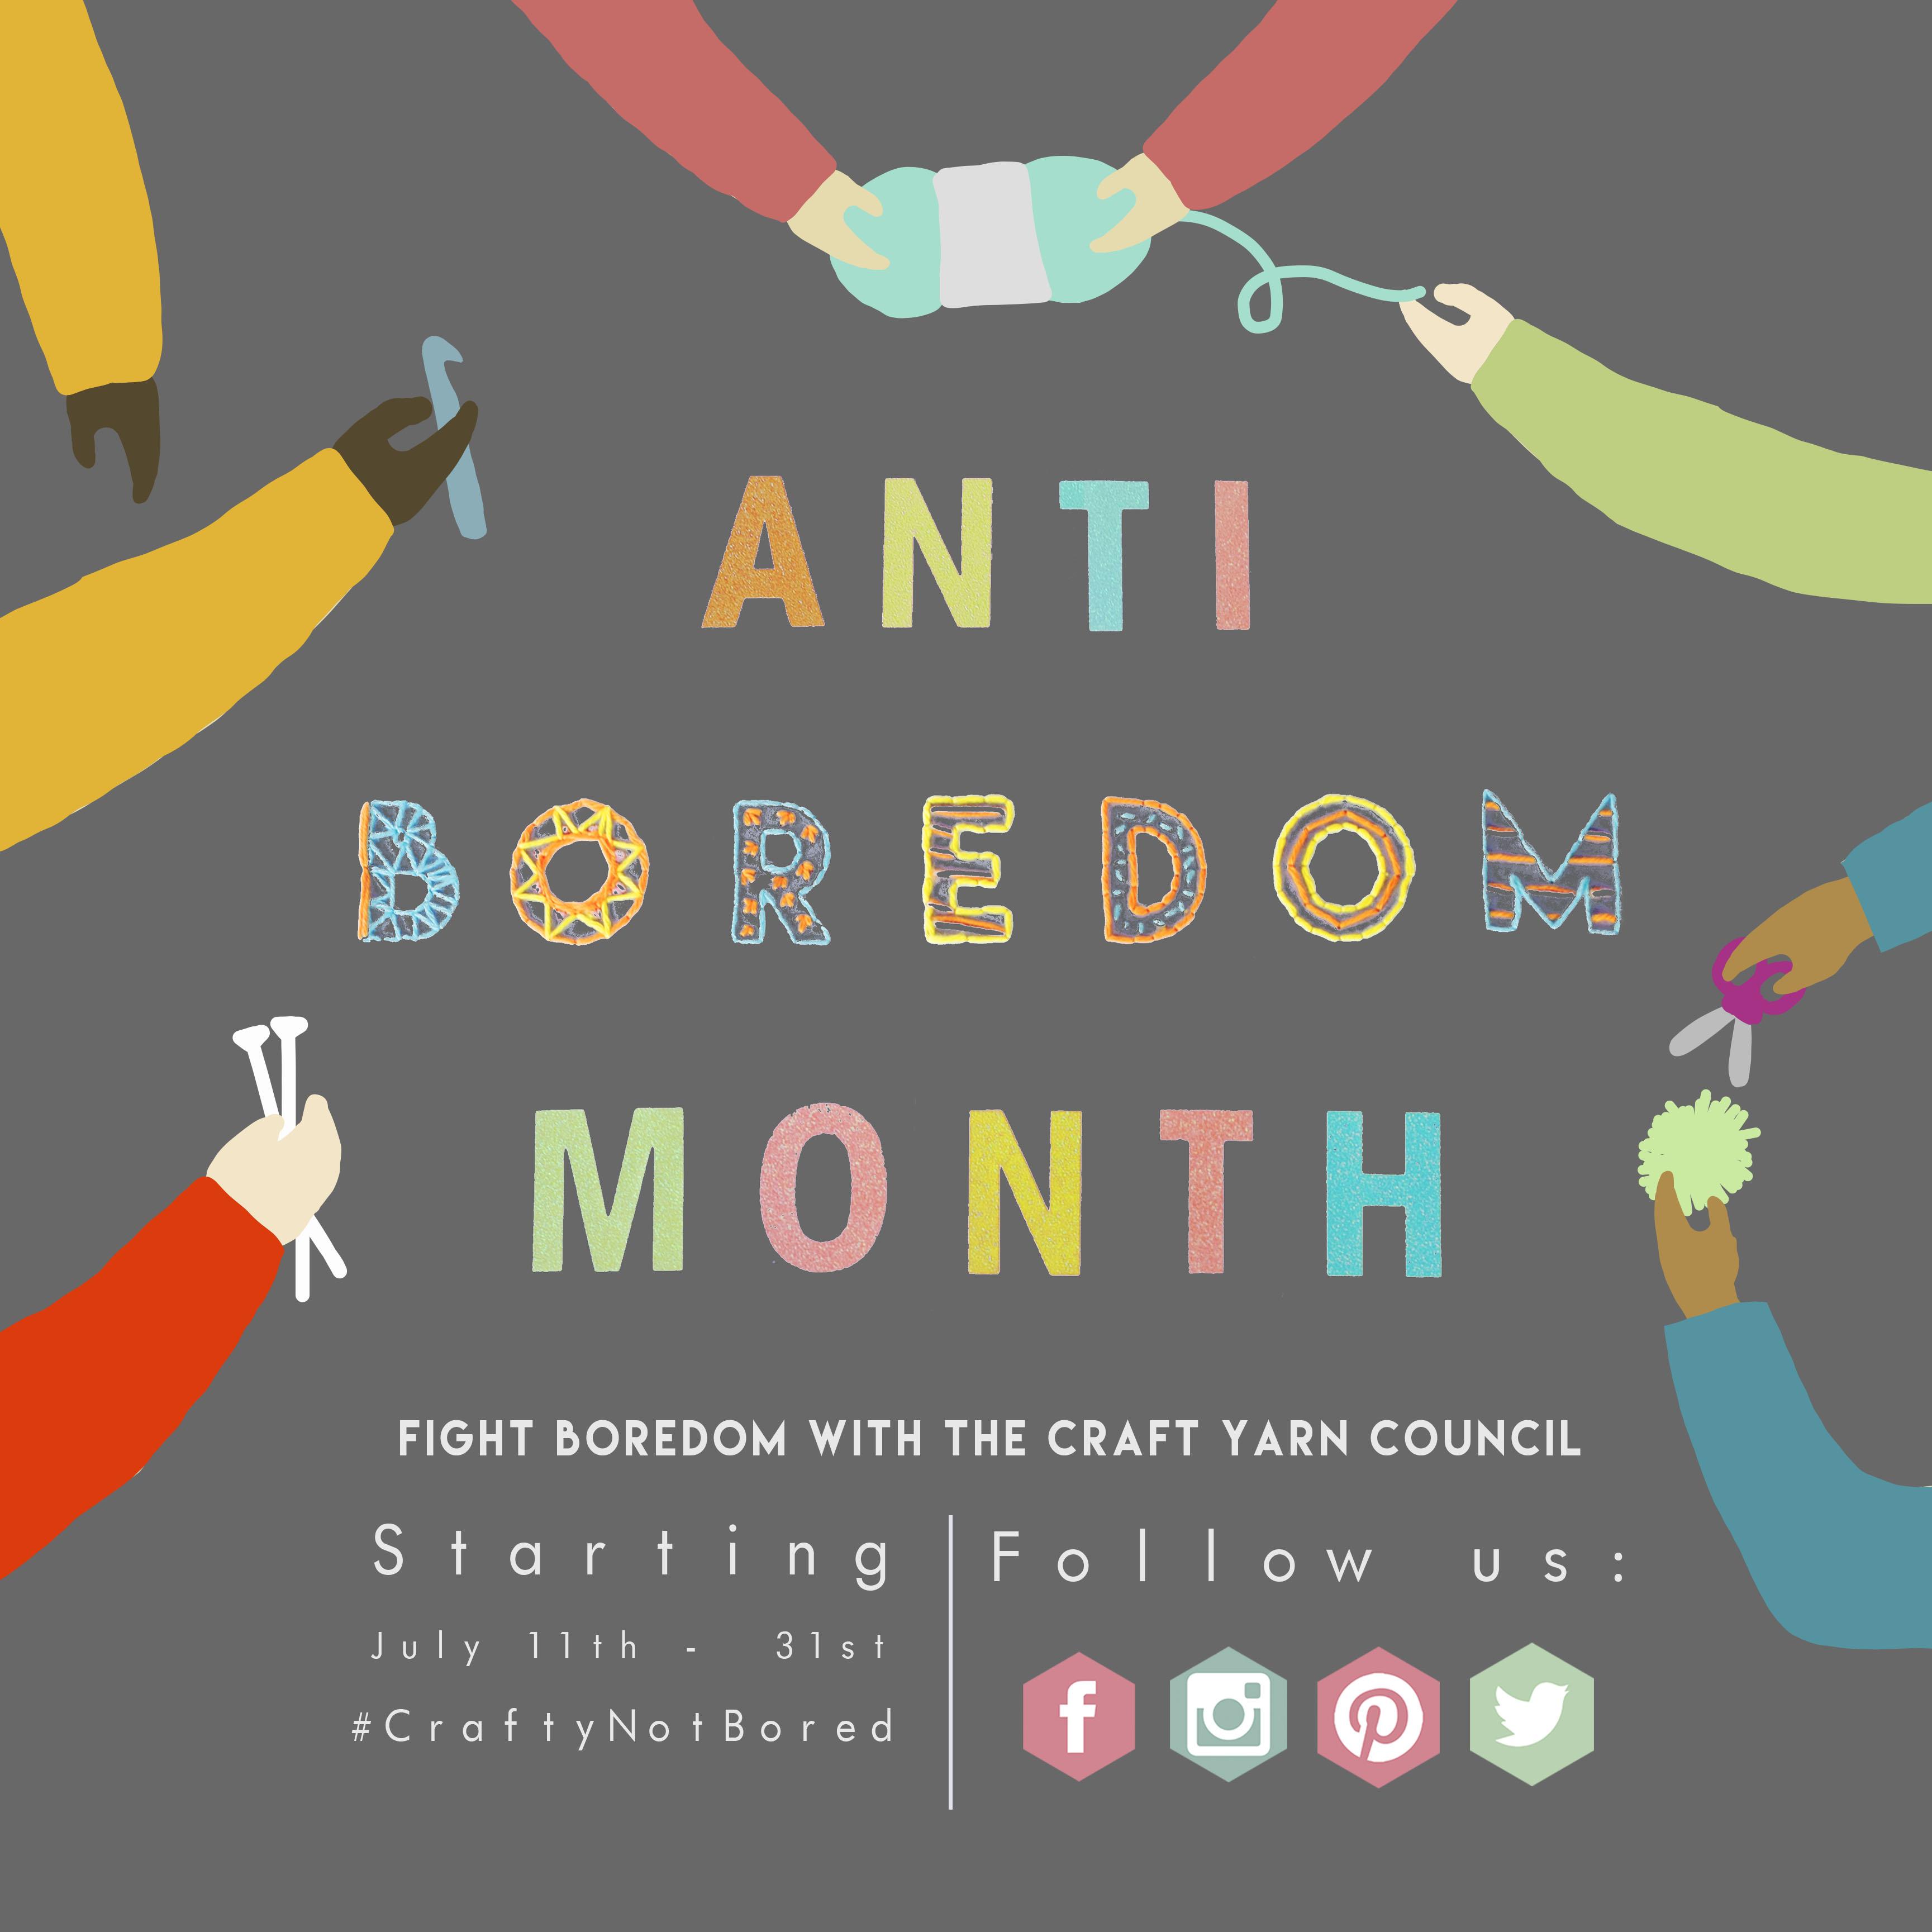 Anti-Boredom Month